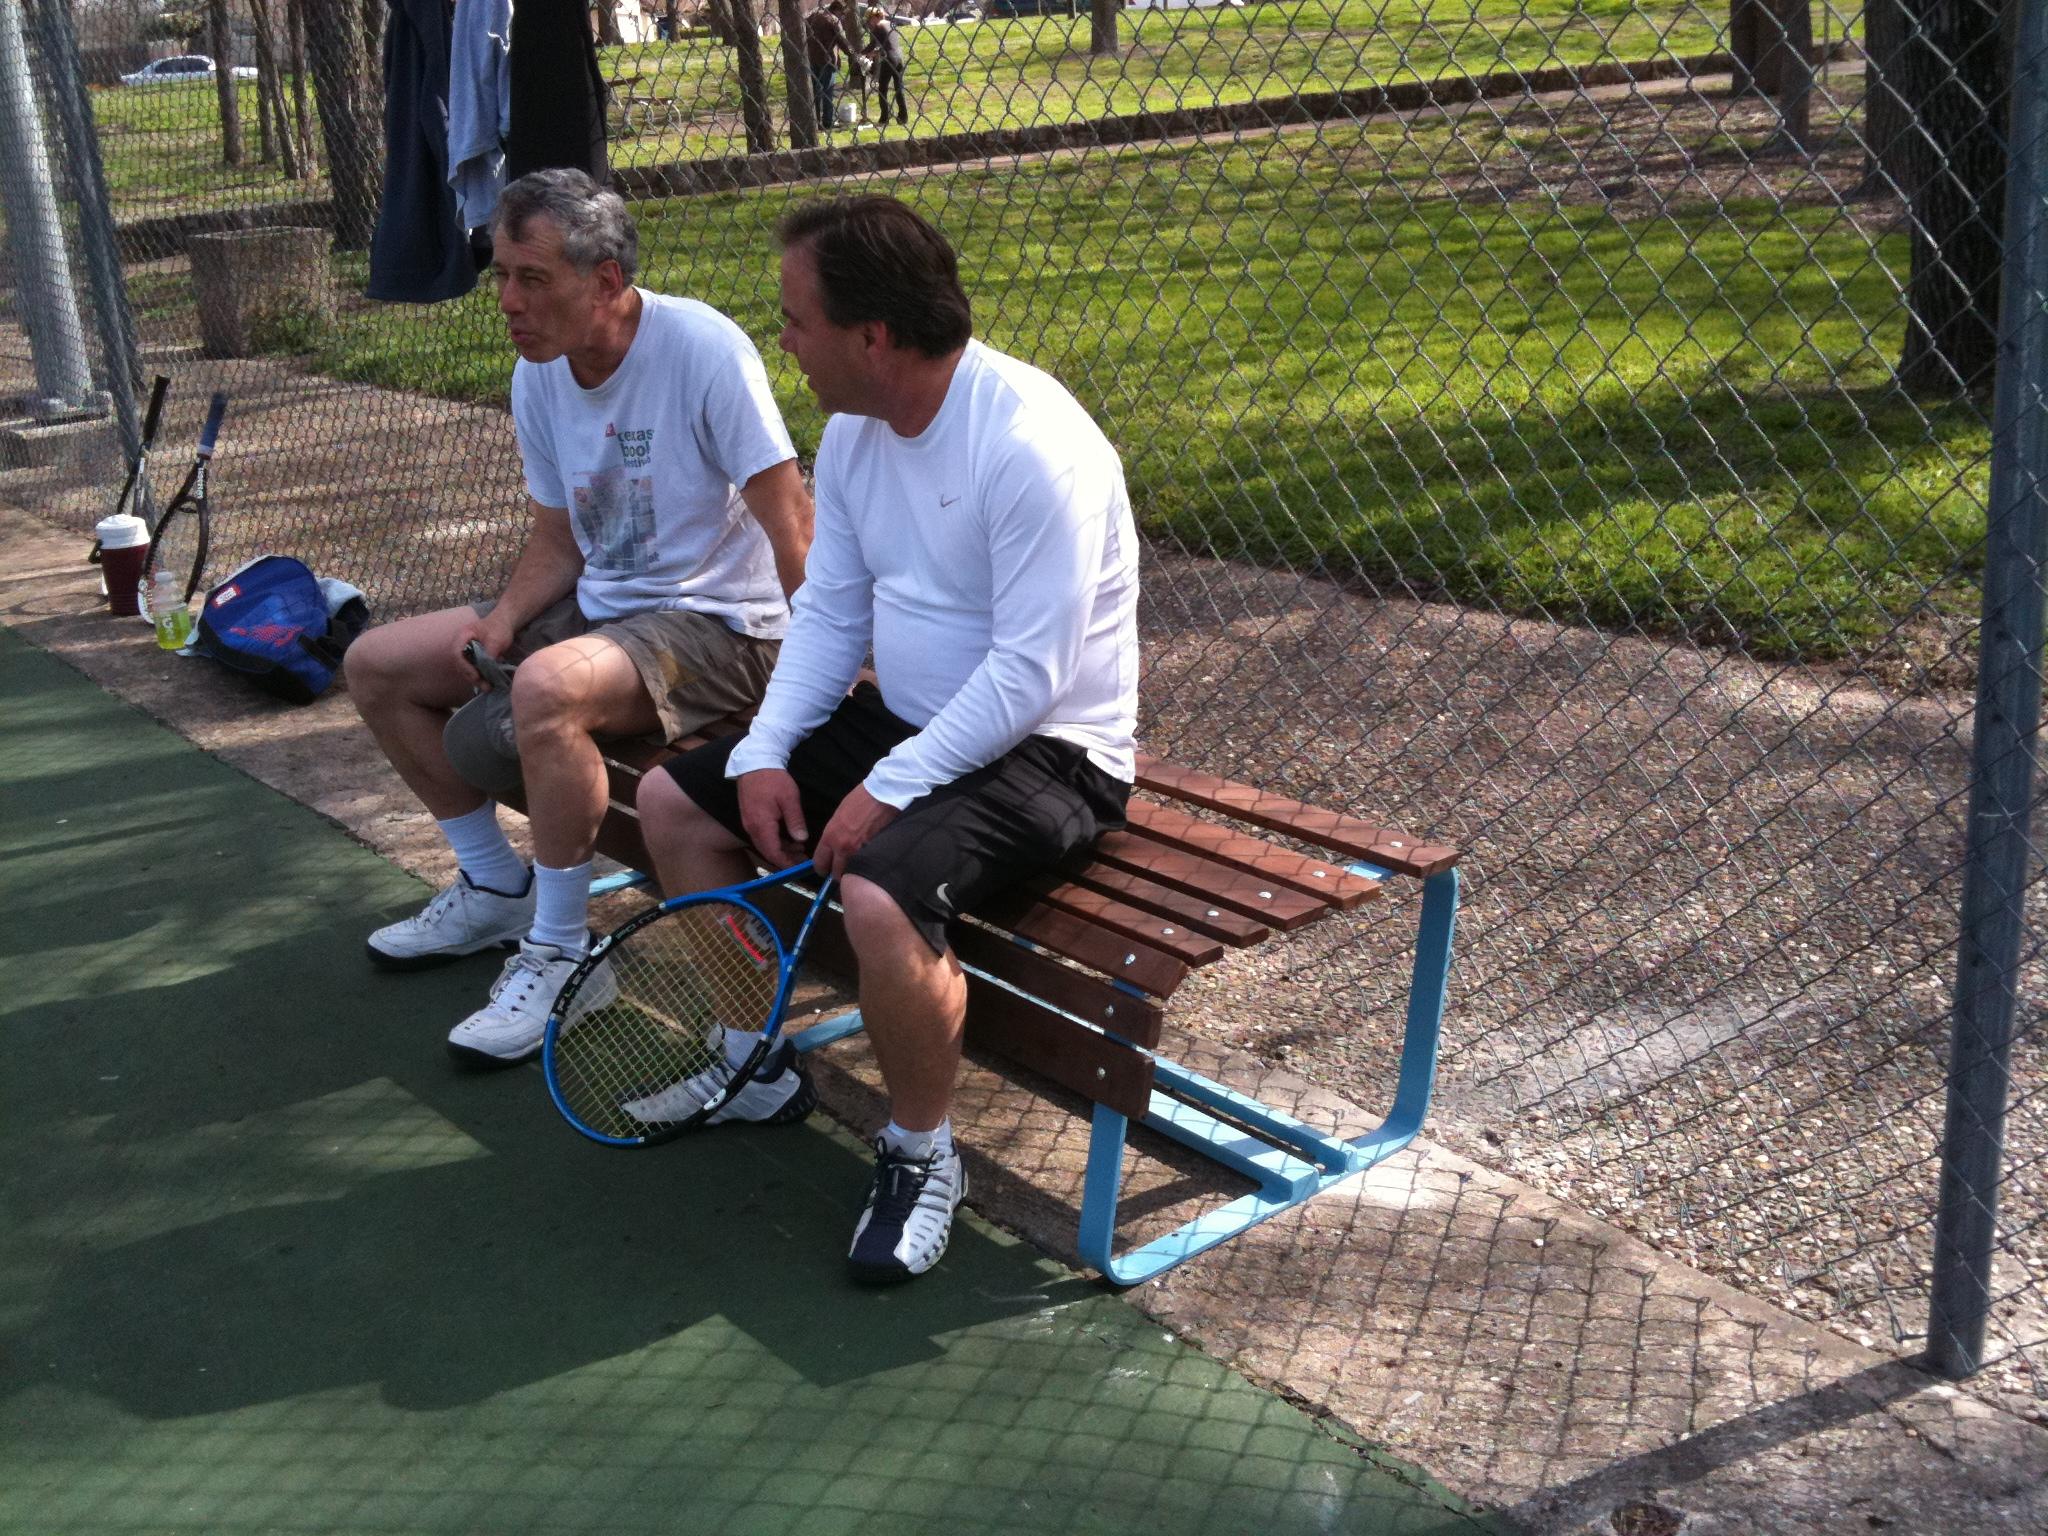 TennisBench1_01.JPG